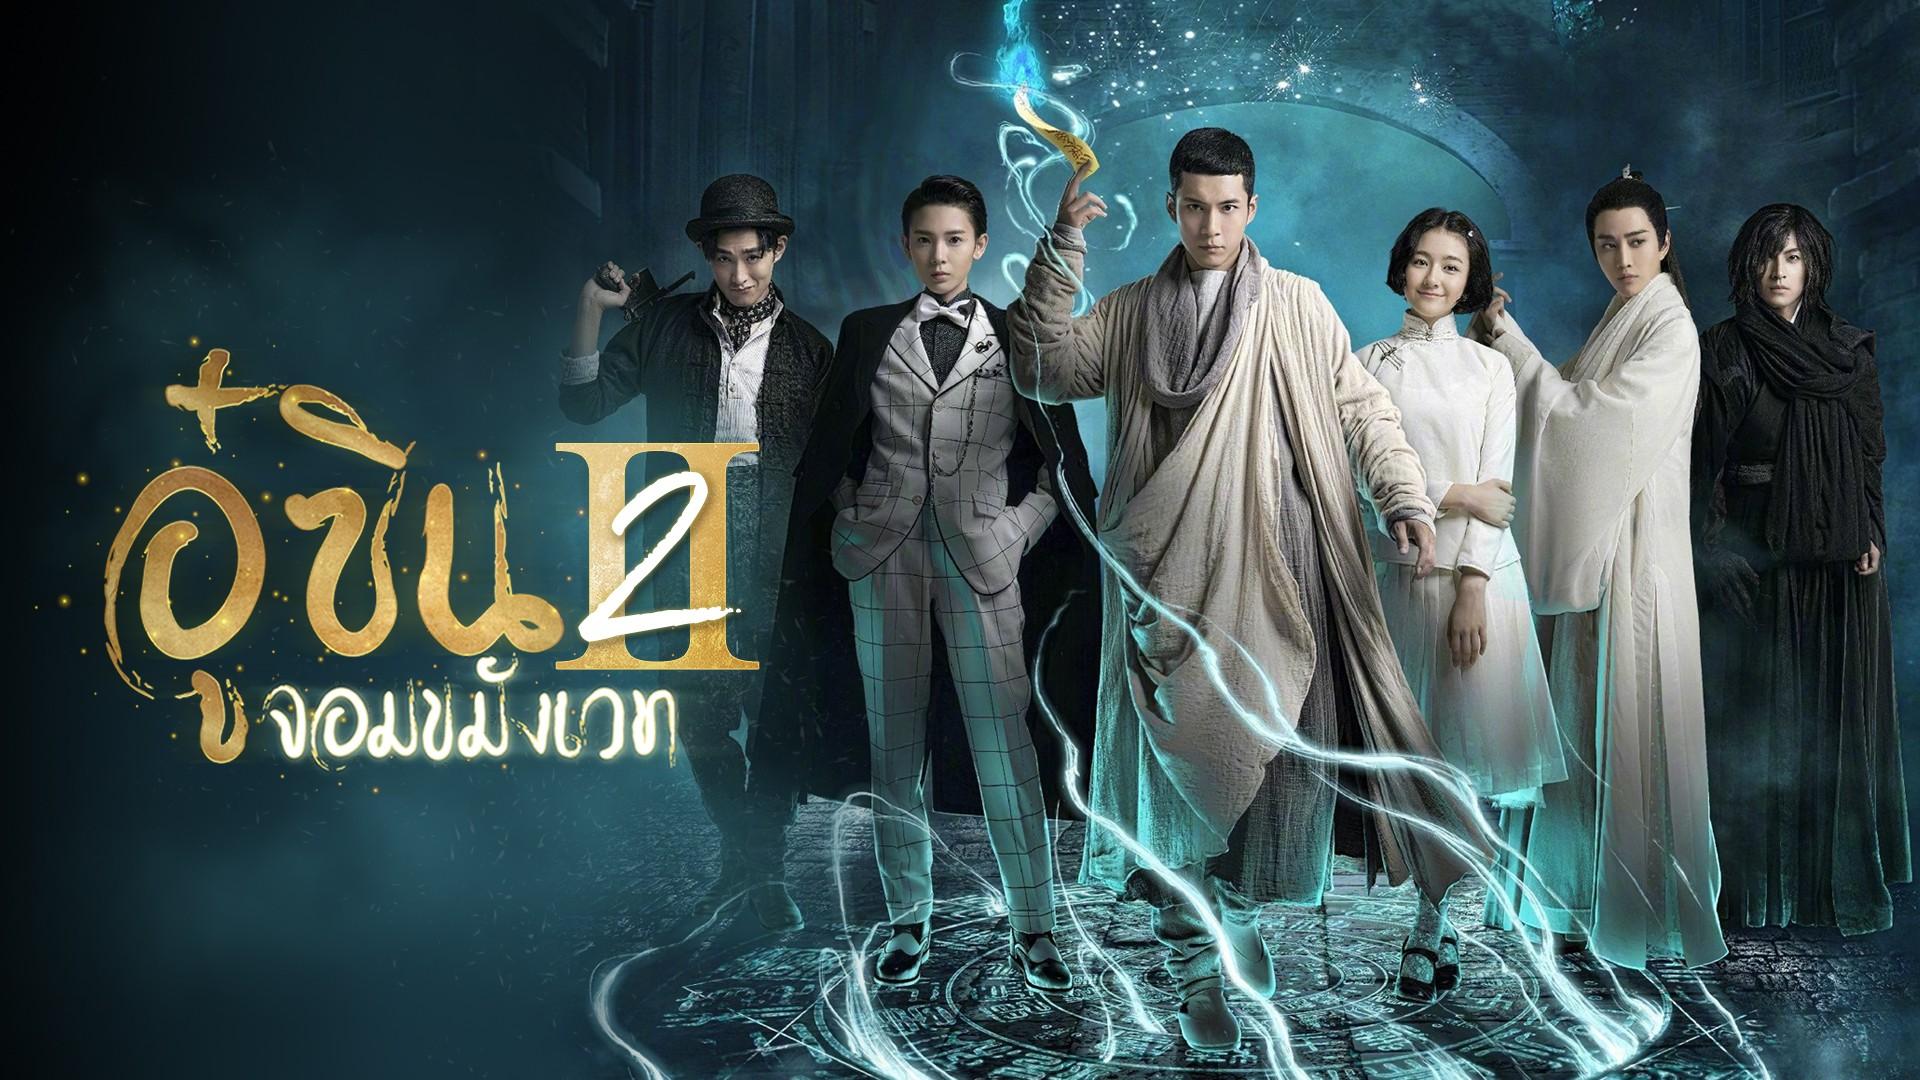 Wu Xin The Monster Killer 2 อู๋ซิน จอมขมังเวท